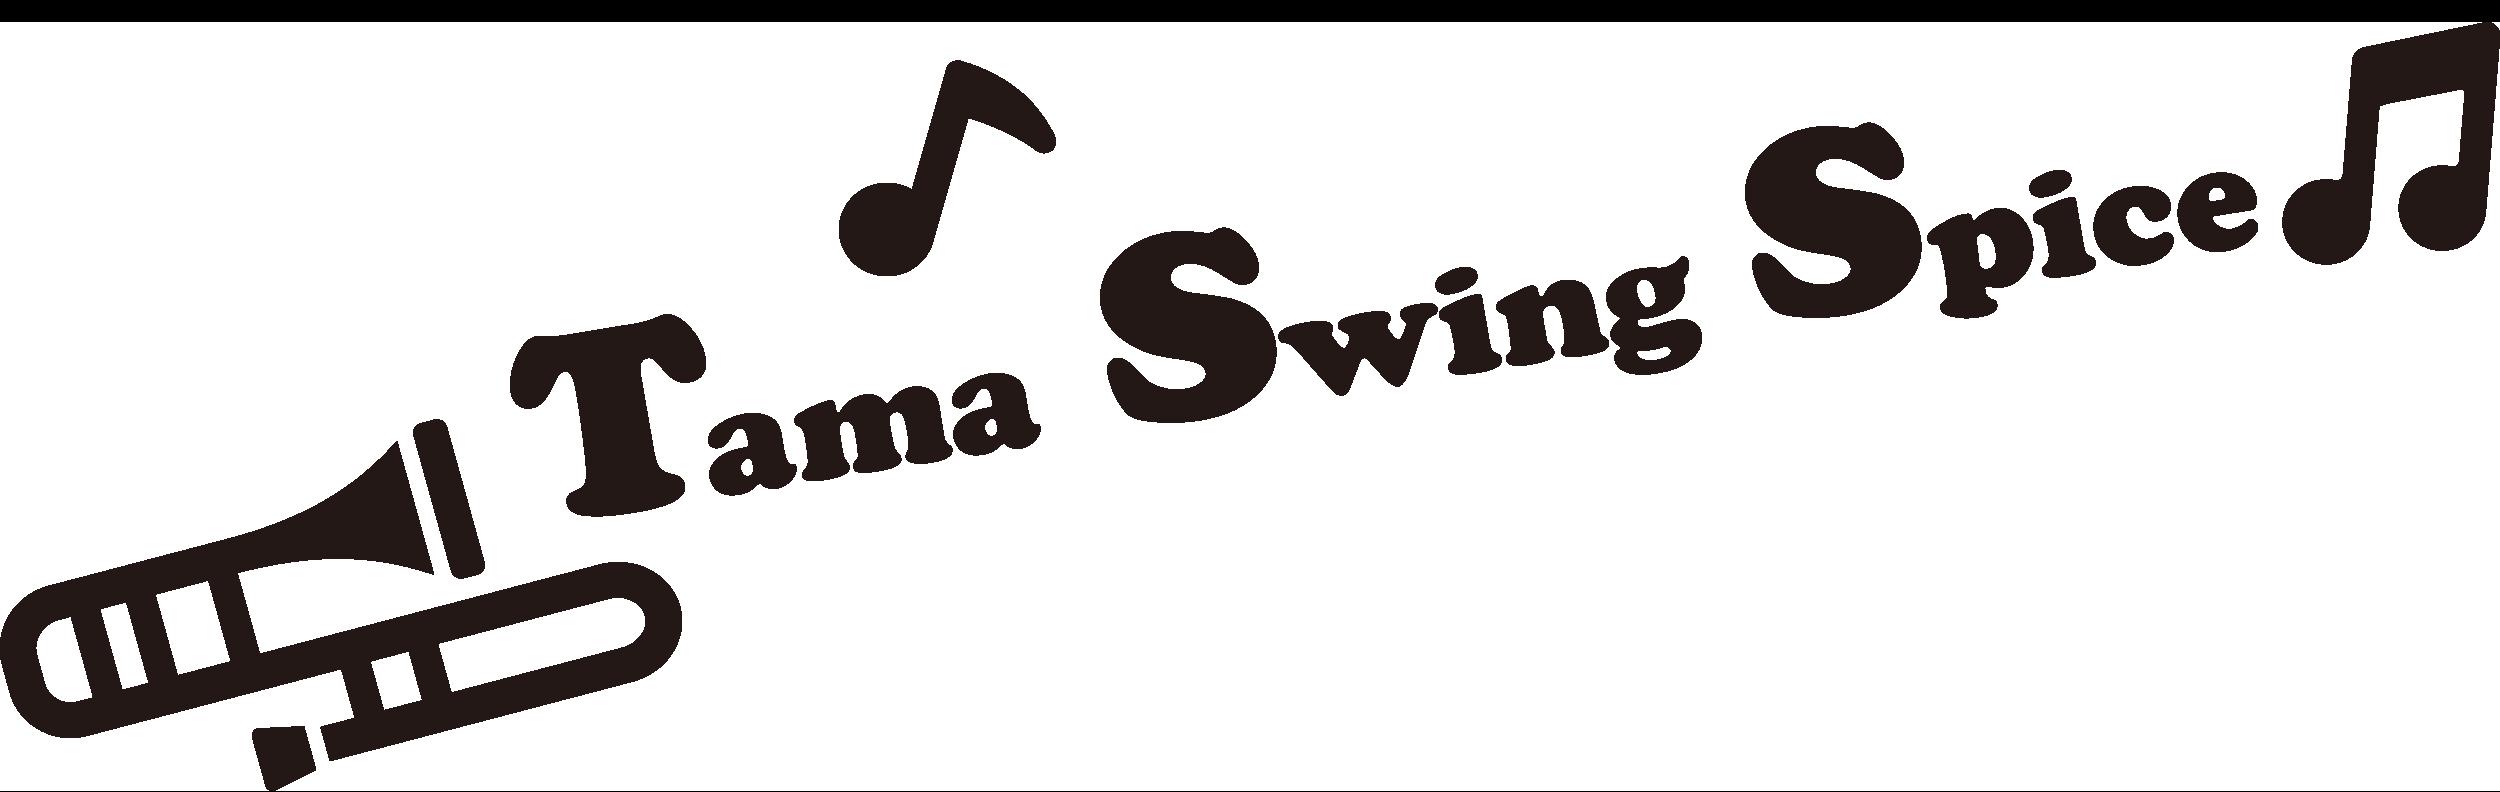 Tama Swing Spice